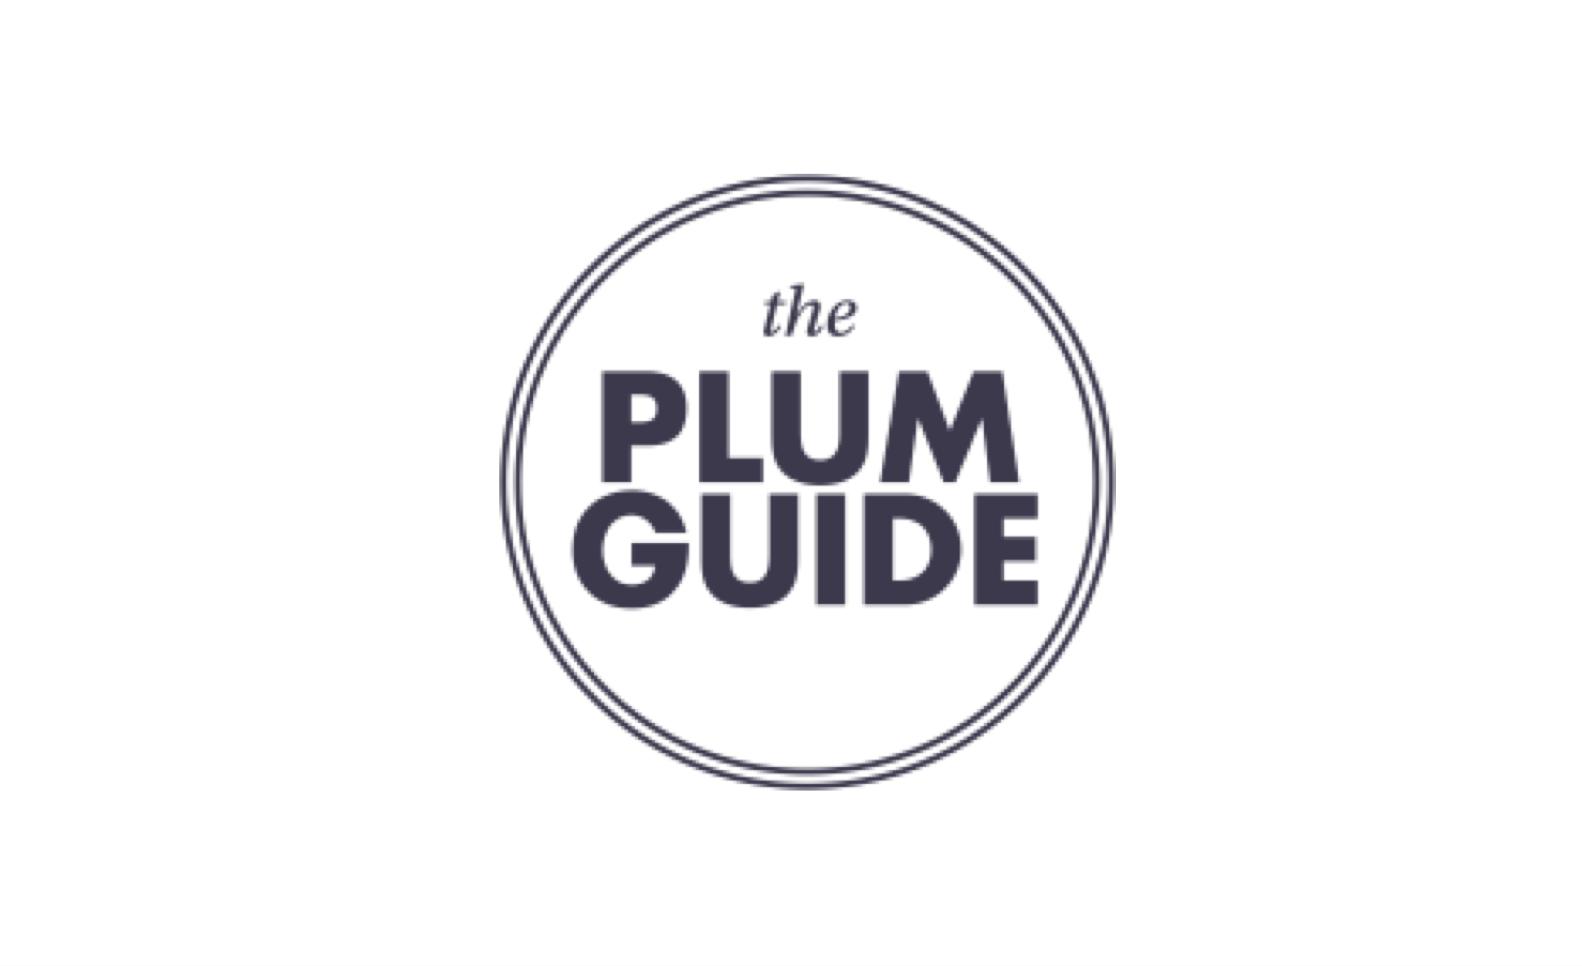 Plumguide on Happyguest.co.uk